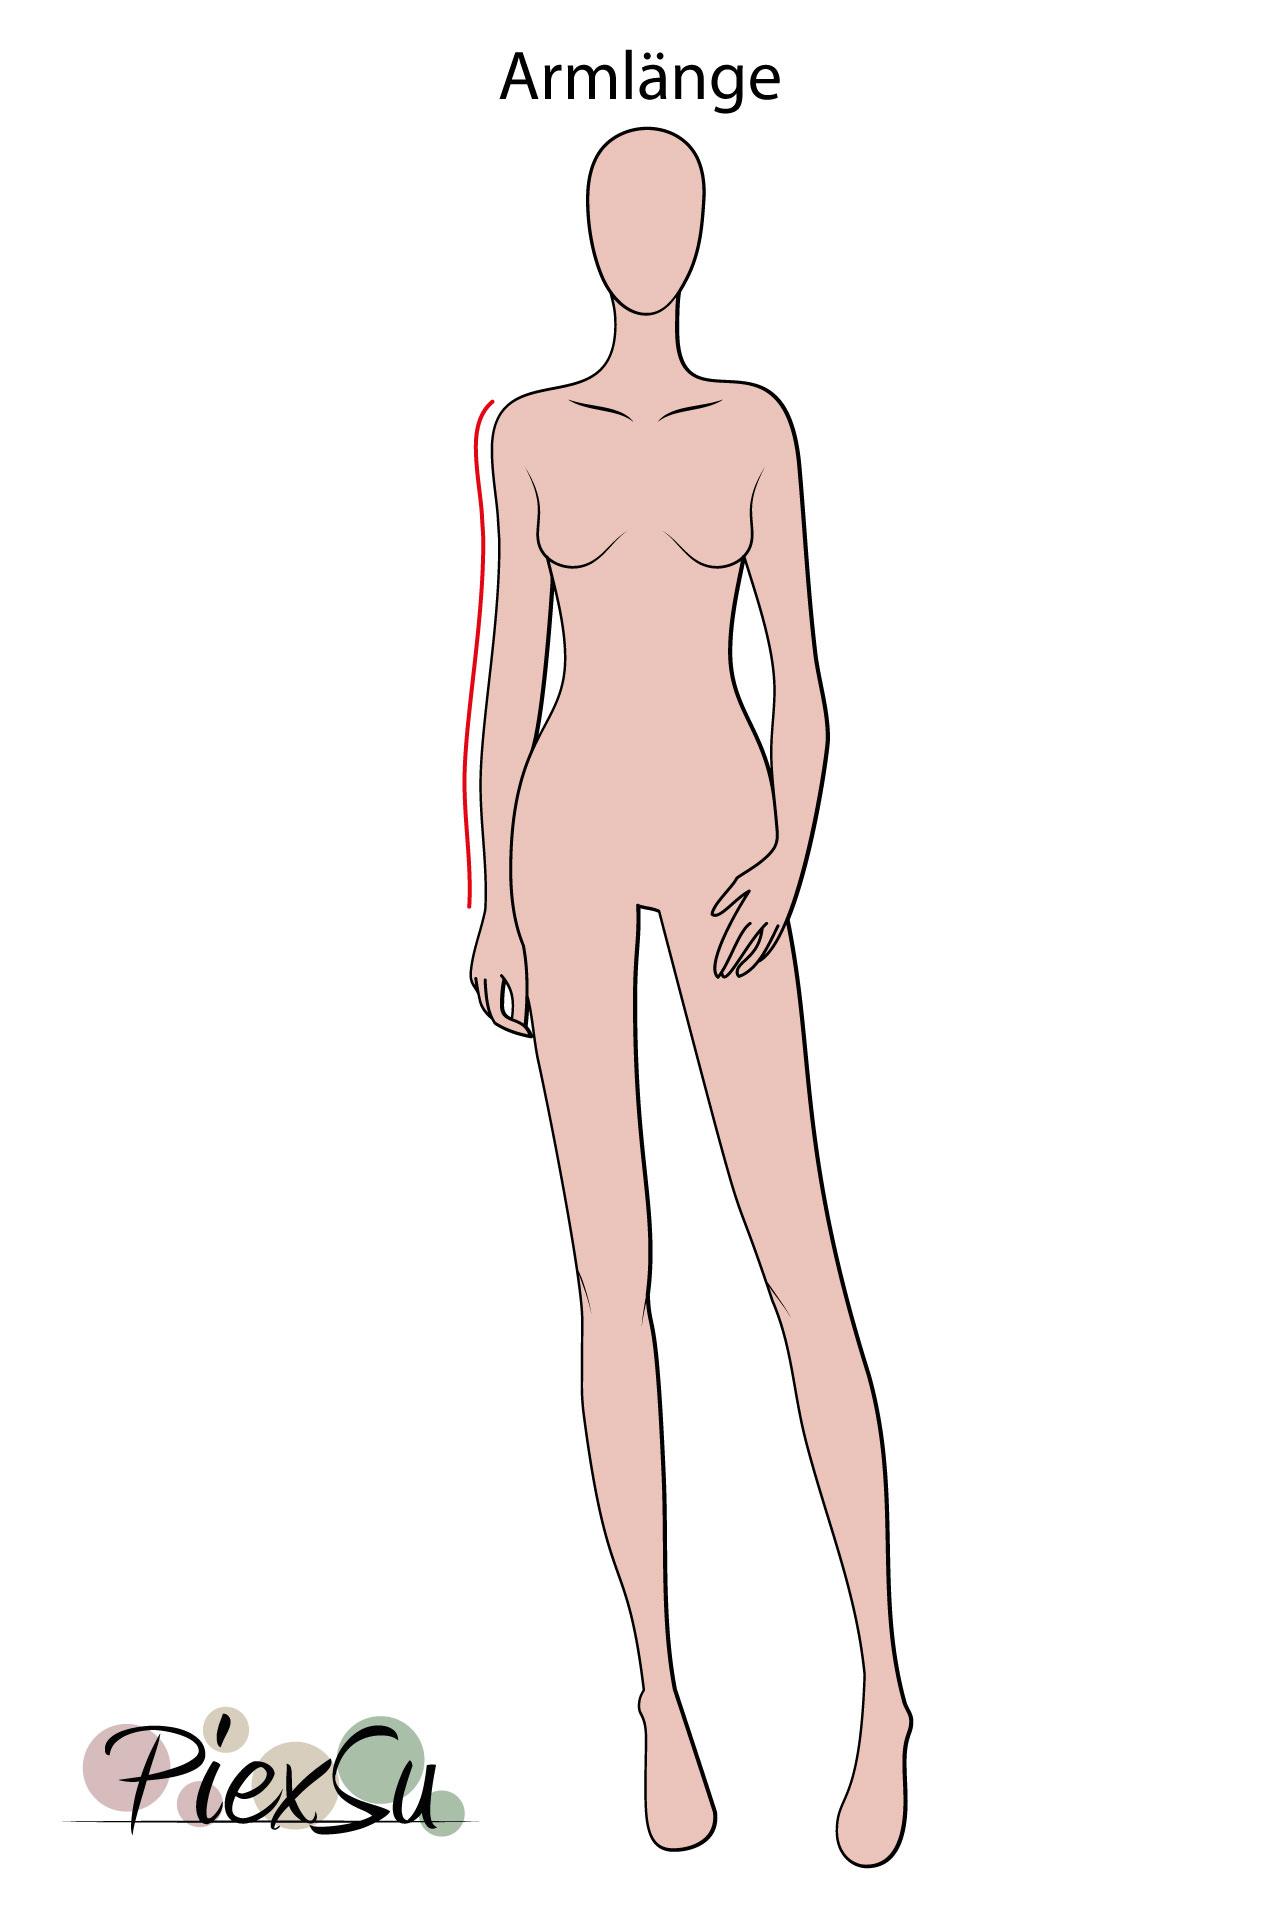 PiexSu-richtig-Maßnehmen-Maße-Schnittmuster-nähen-Schnittmuster-anpassen-messen-Maßband-Armlänge